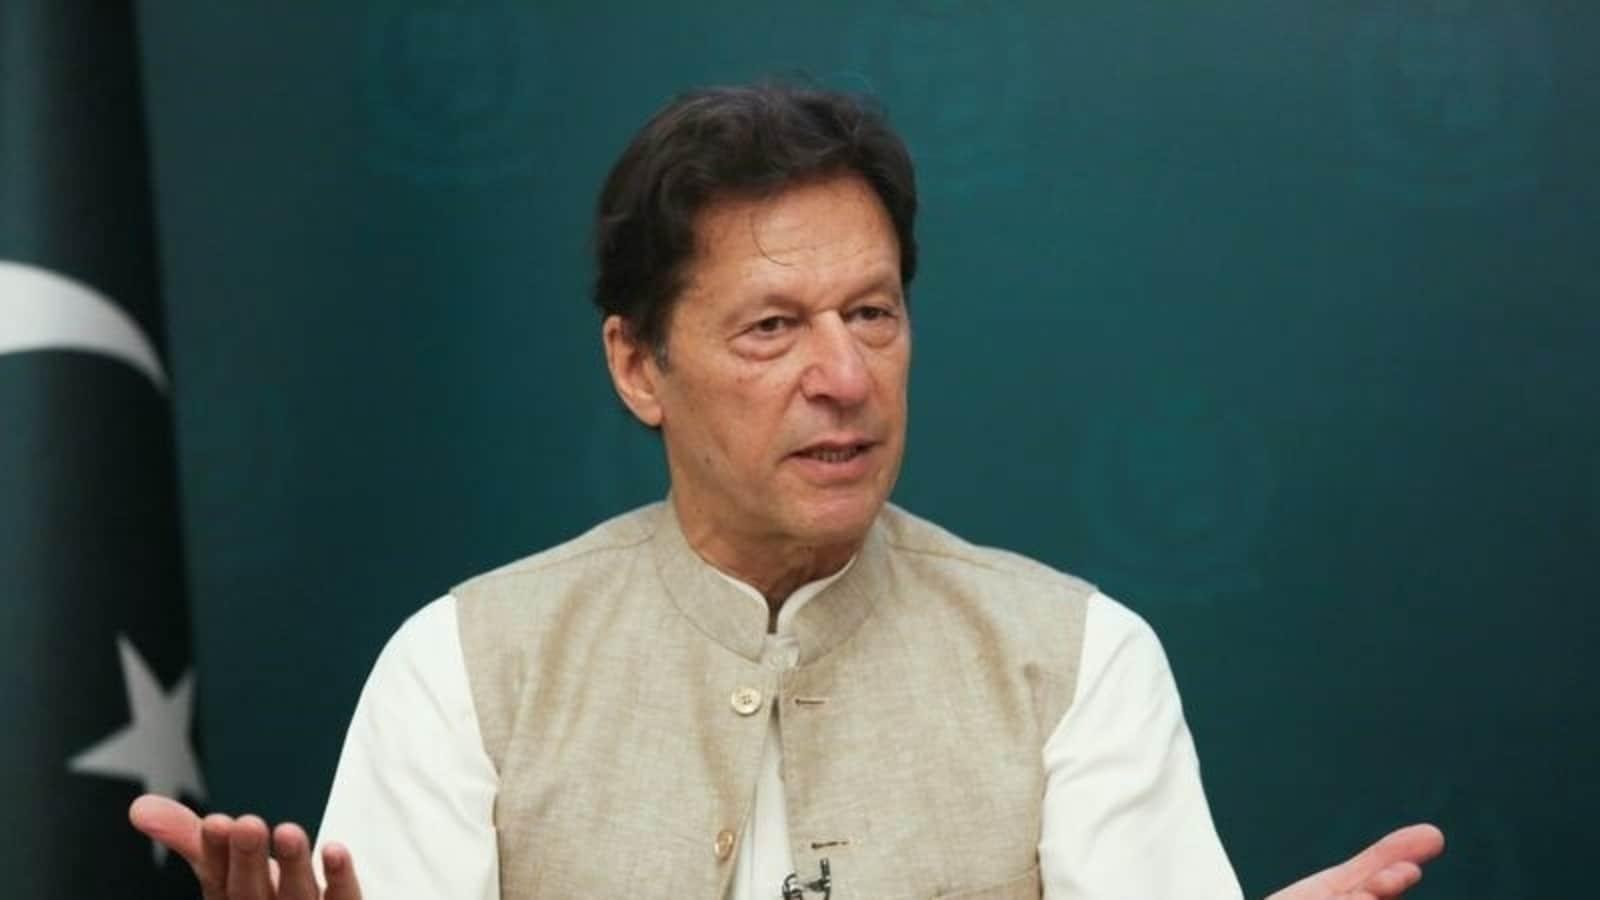 Taliban are normal civilians': Pak PM Imran Khan on providing 'safe haven'  to terrorists   World News - Hindustan Times